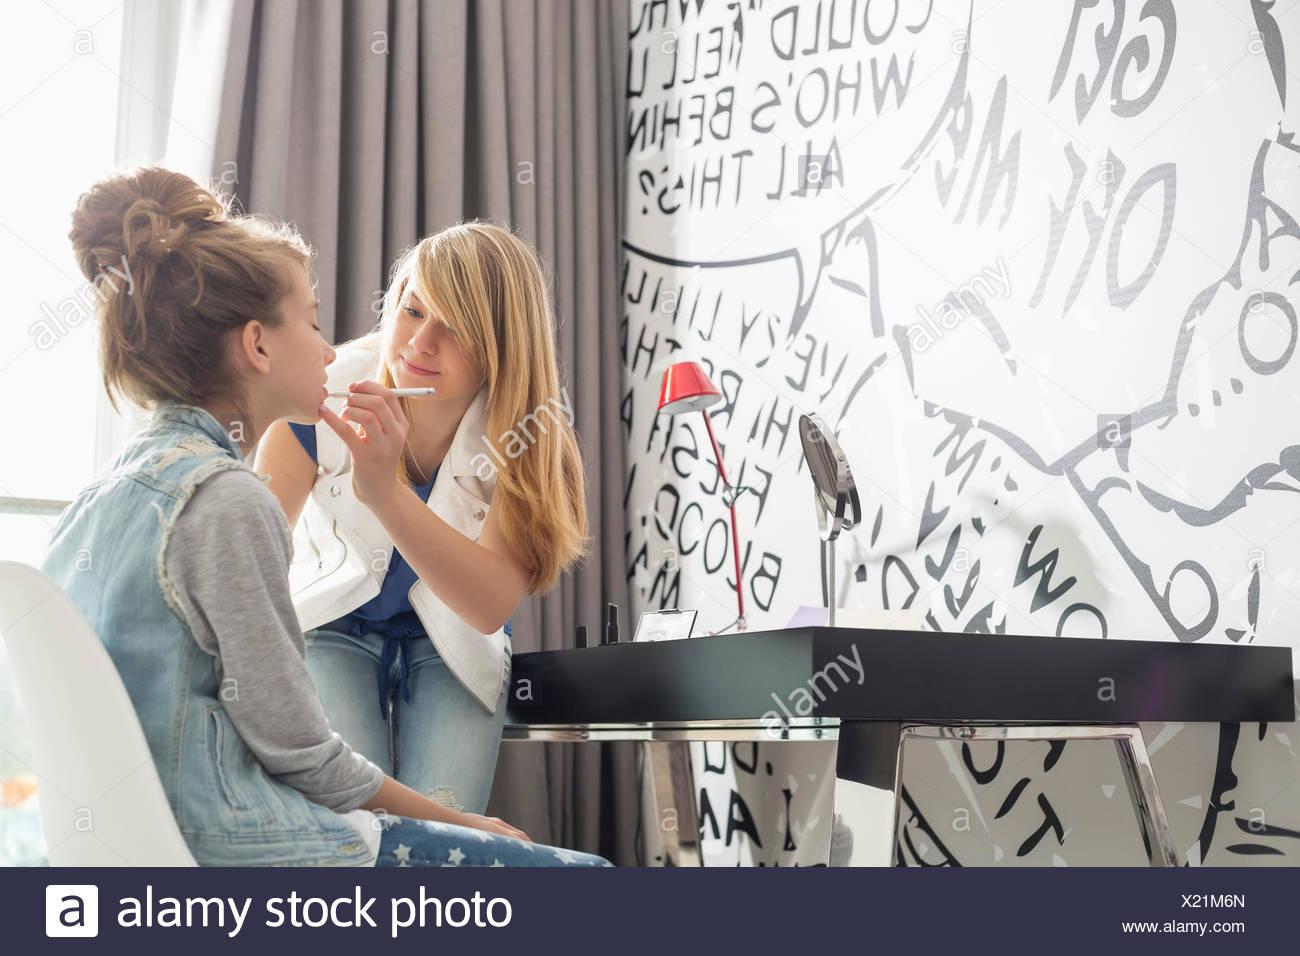 Teenage girl putting lipstick on sister at home - Stock Image